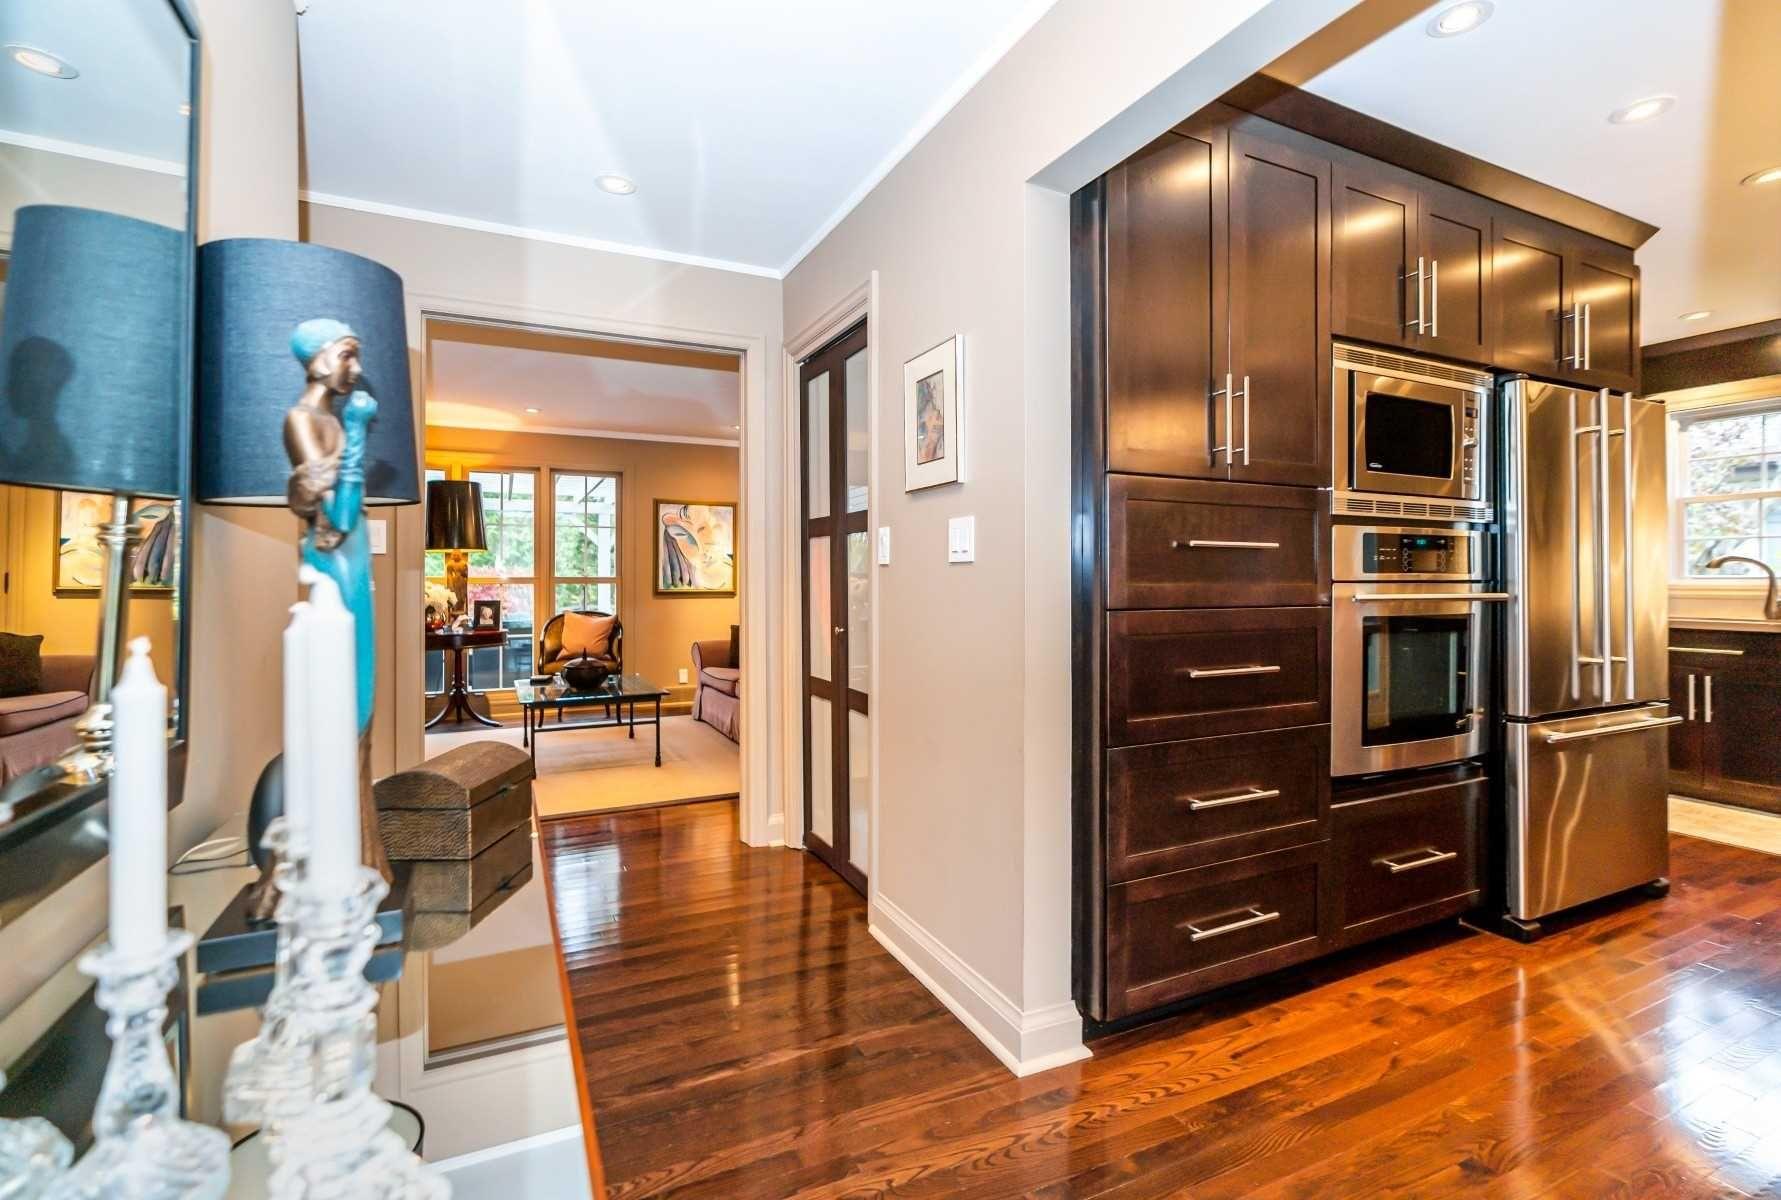 Photo 4: Photos: 782 Bessborough Drive in Oshawa: Centennial House (Bungalow) for sale : MLS®# E4968487